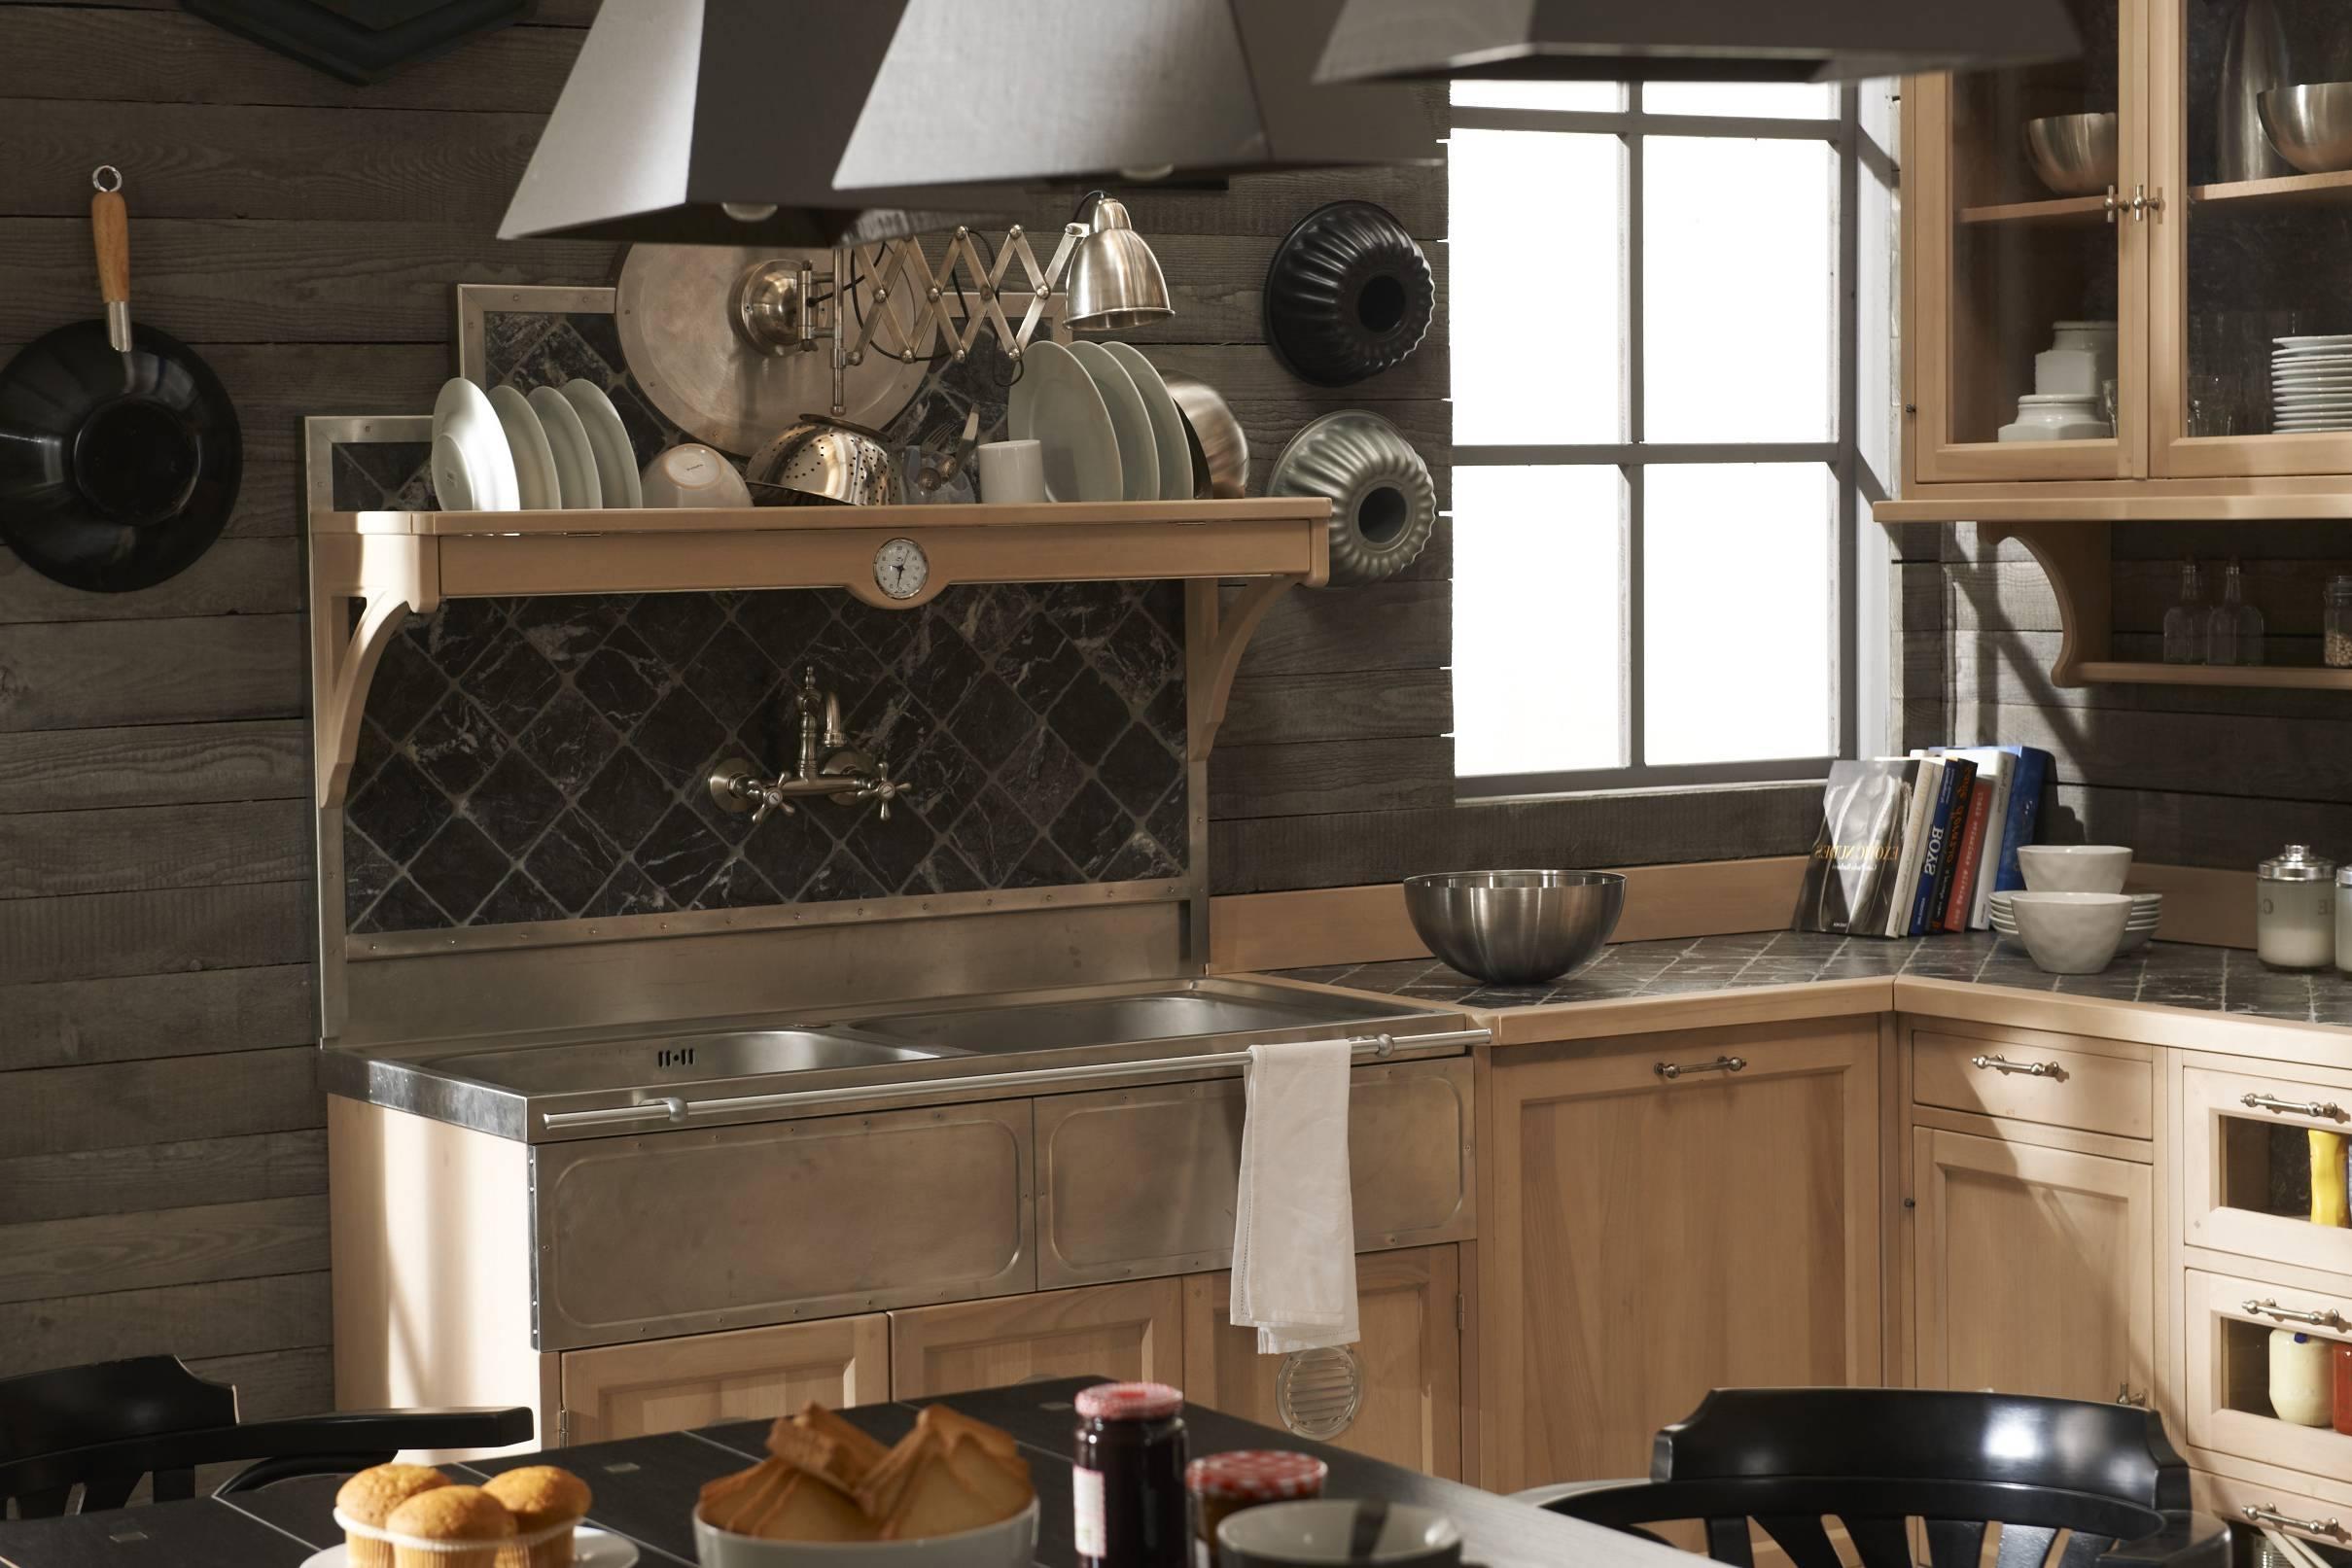 Marchi Cucine Moderne Perfect Cucine Moderne Marchi Group - Marche ...